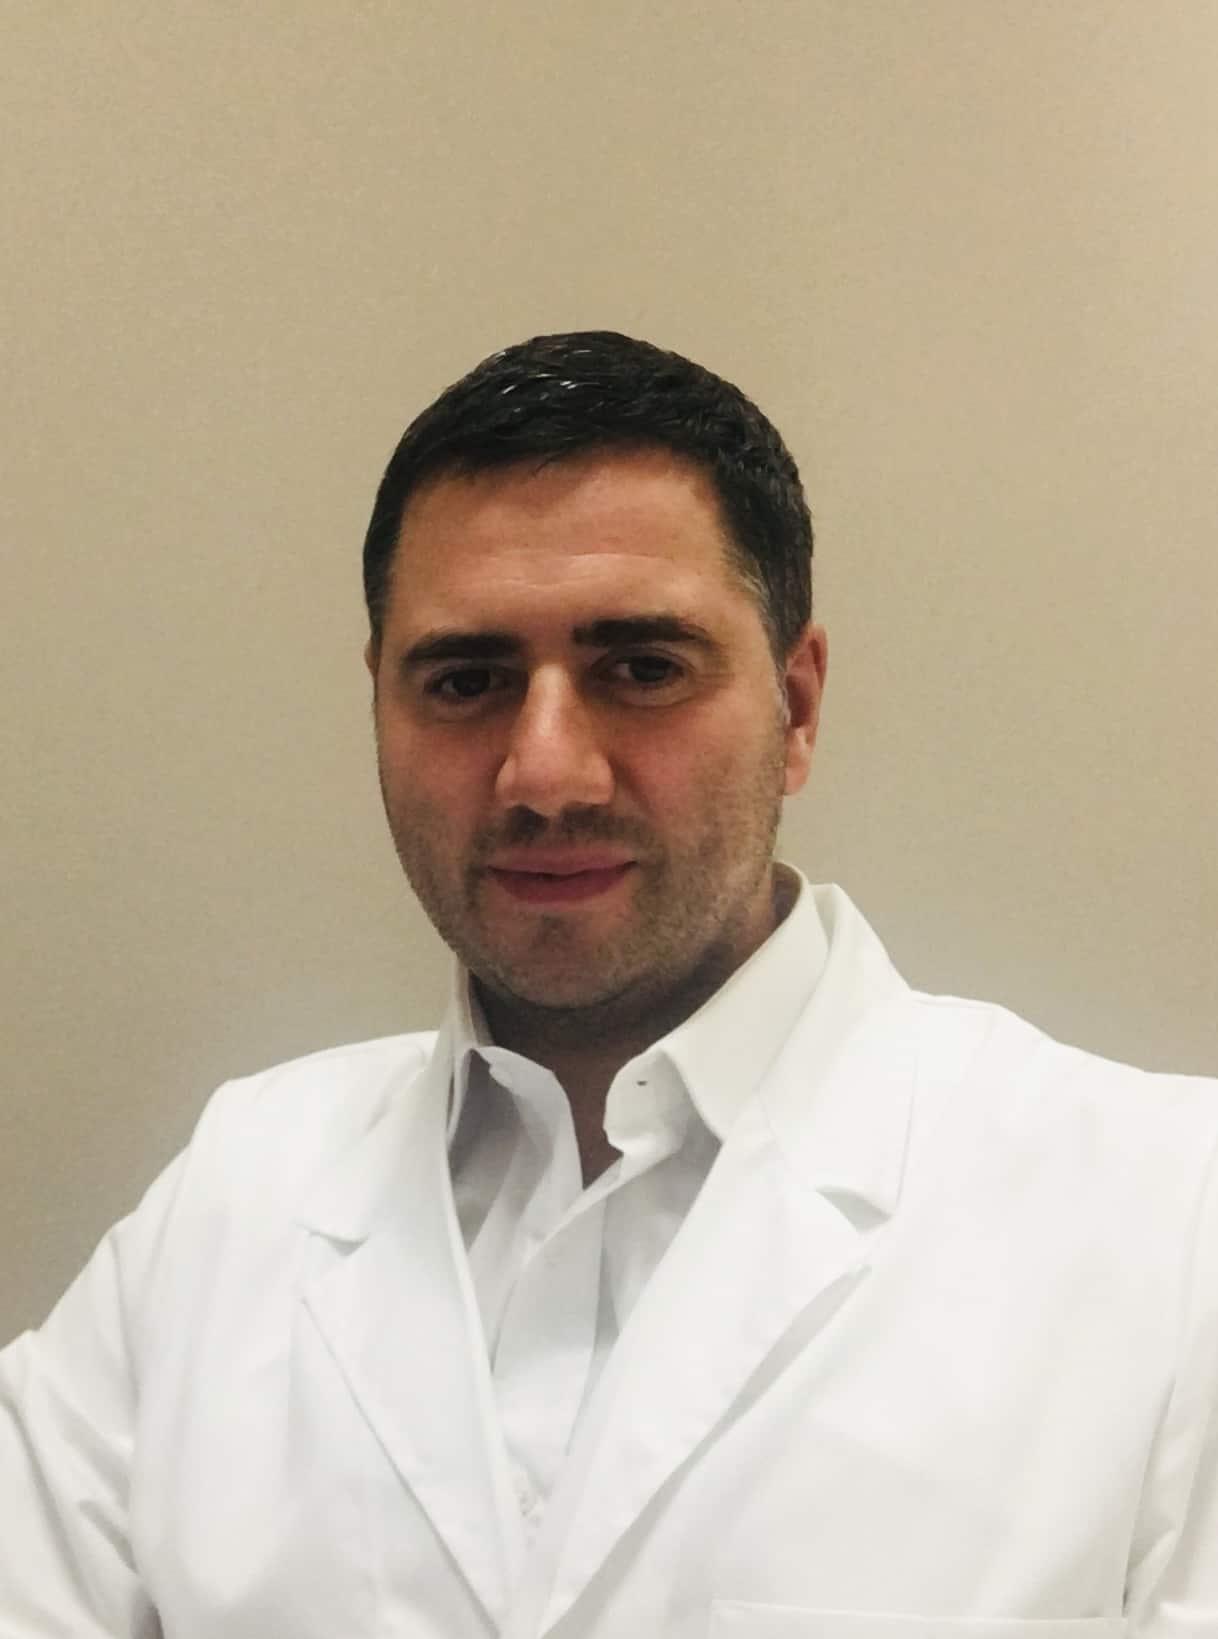 Dott. GERARDO D'AMATO